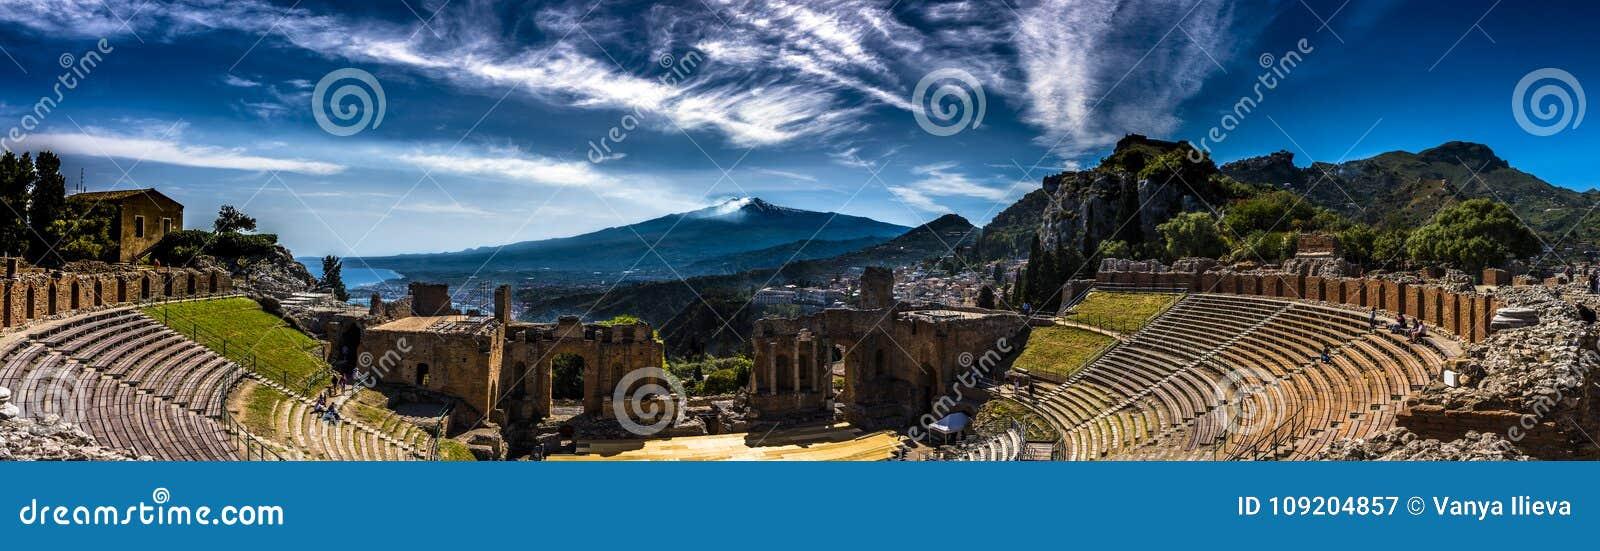 Panorama van het Oude Theater in Taormina, Sicilië